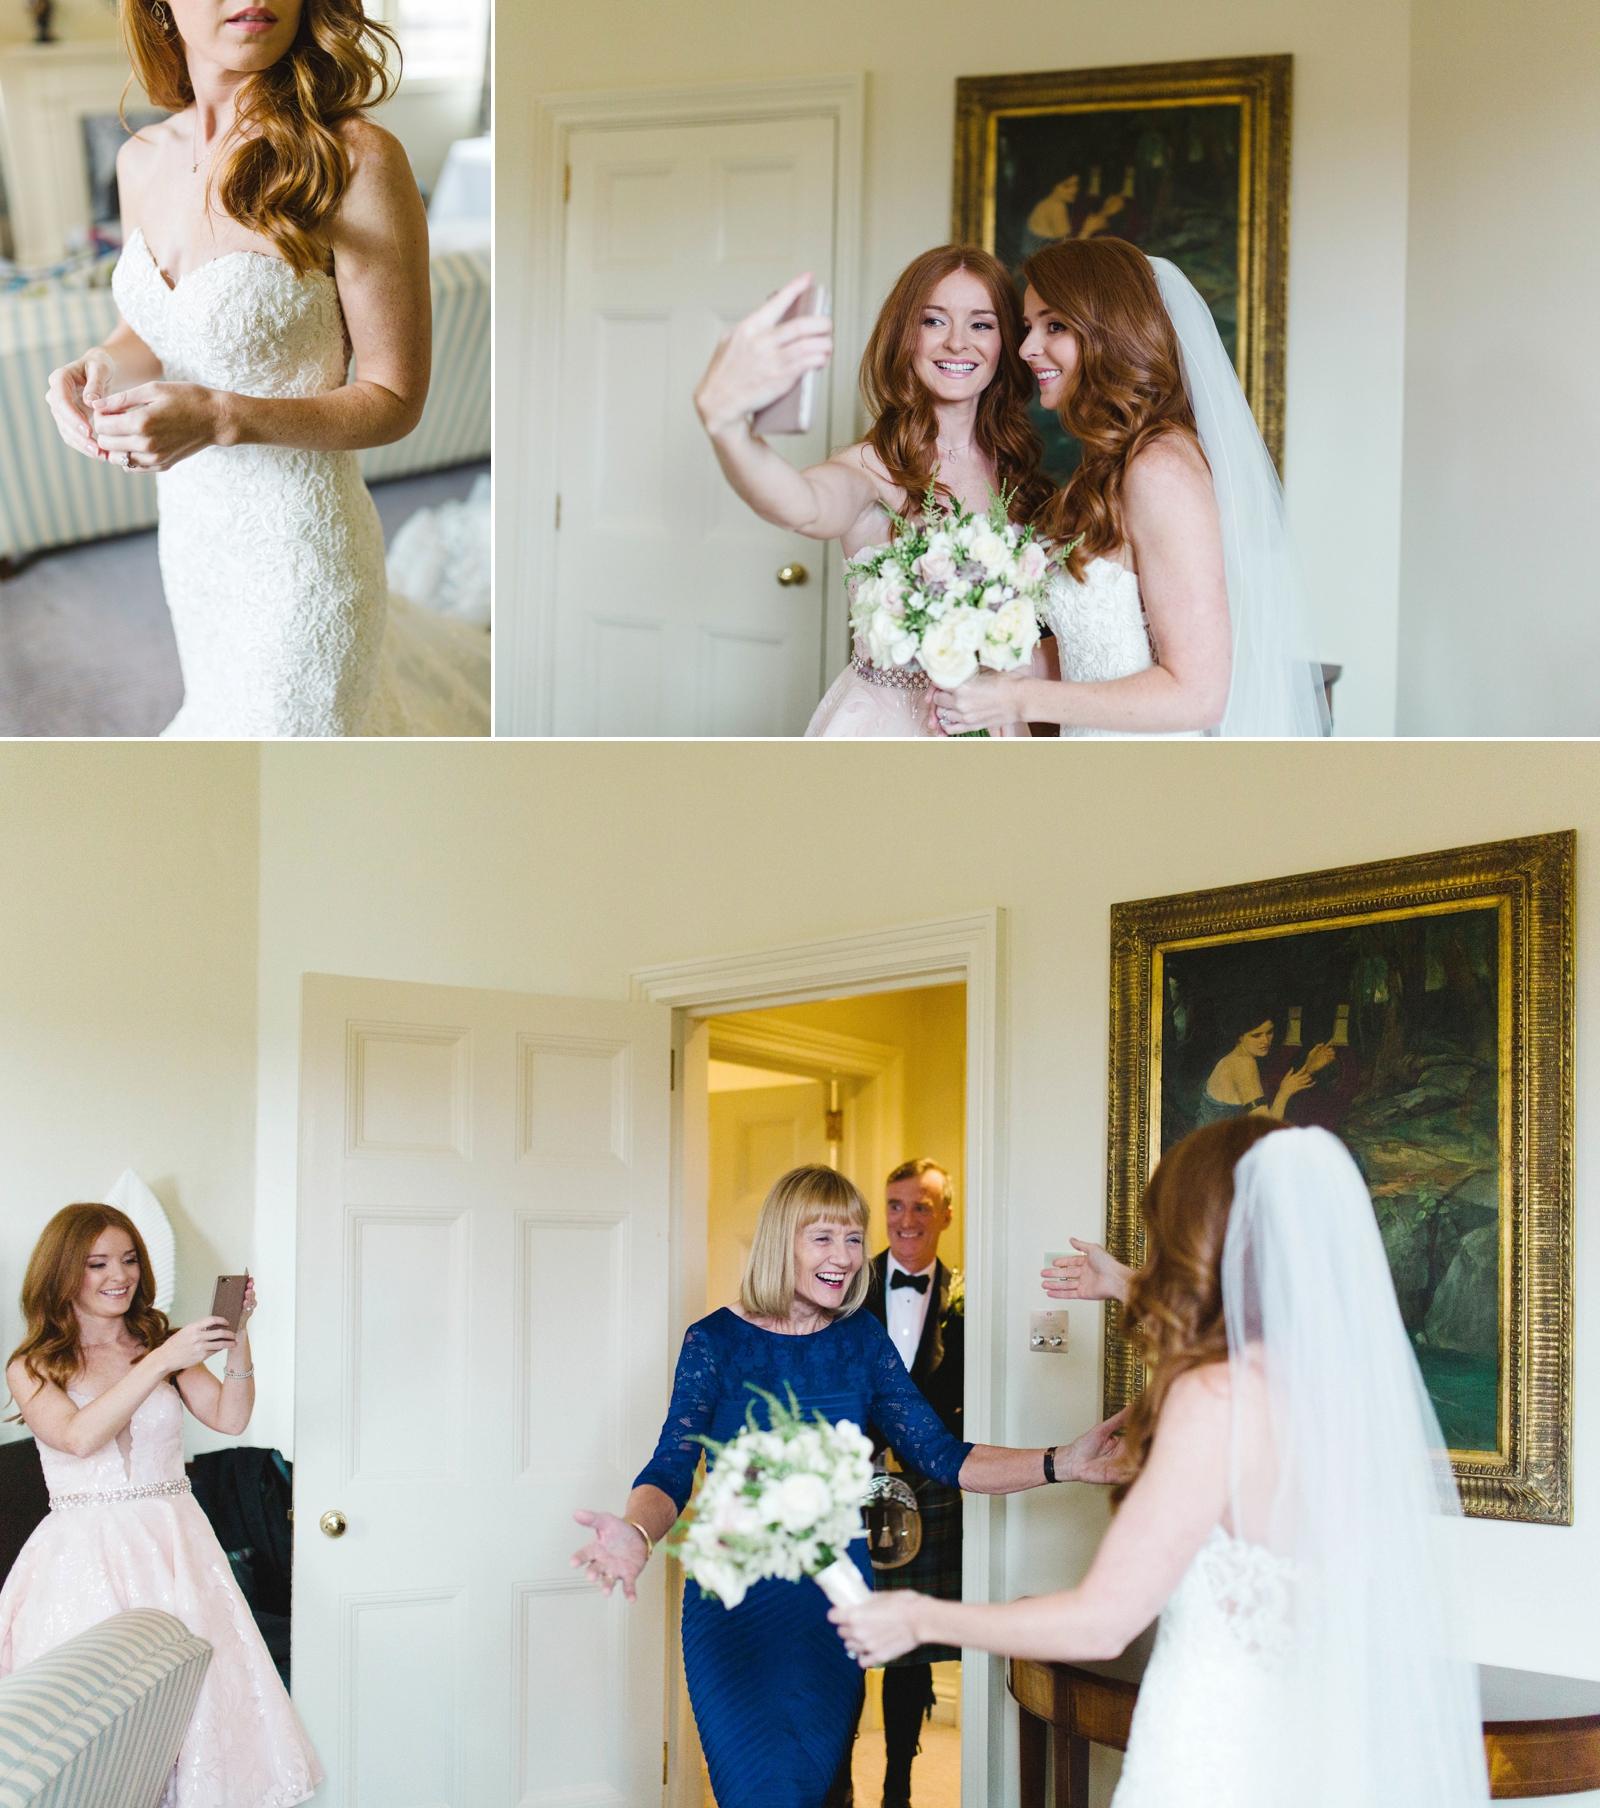 weddingbalmoralhoteledinburgh13-11.jpg